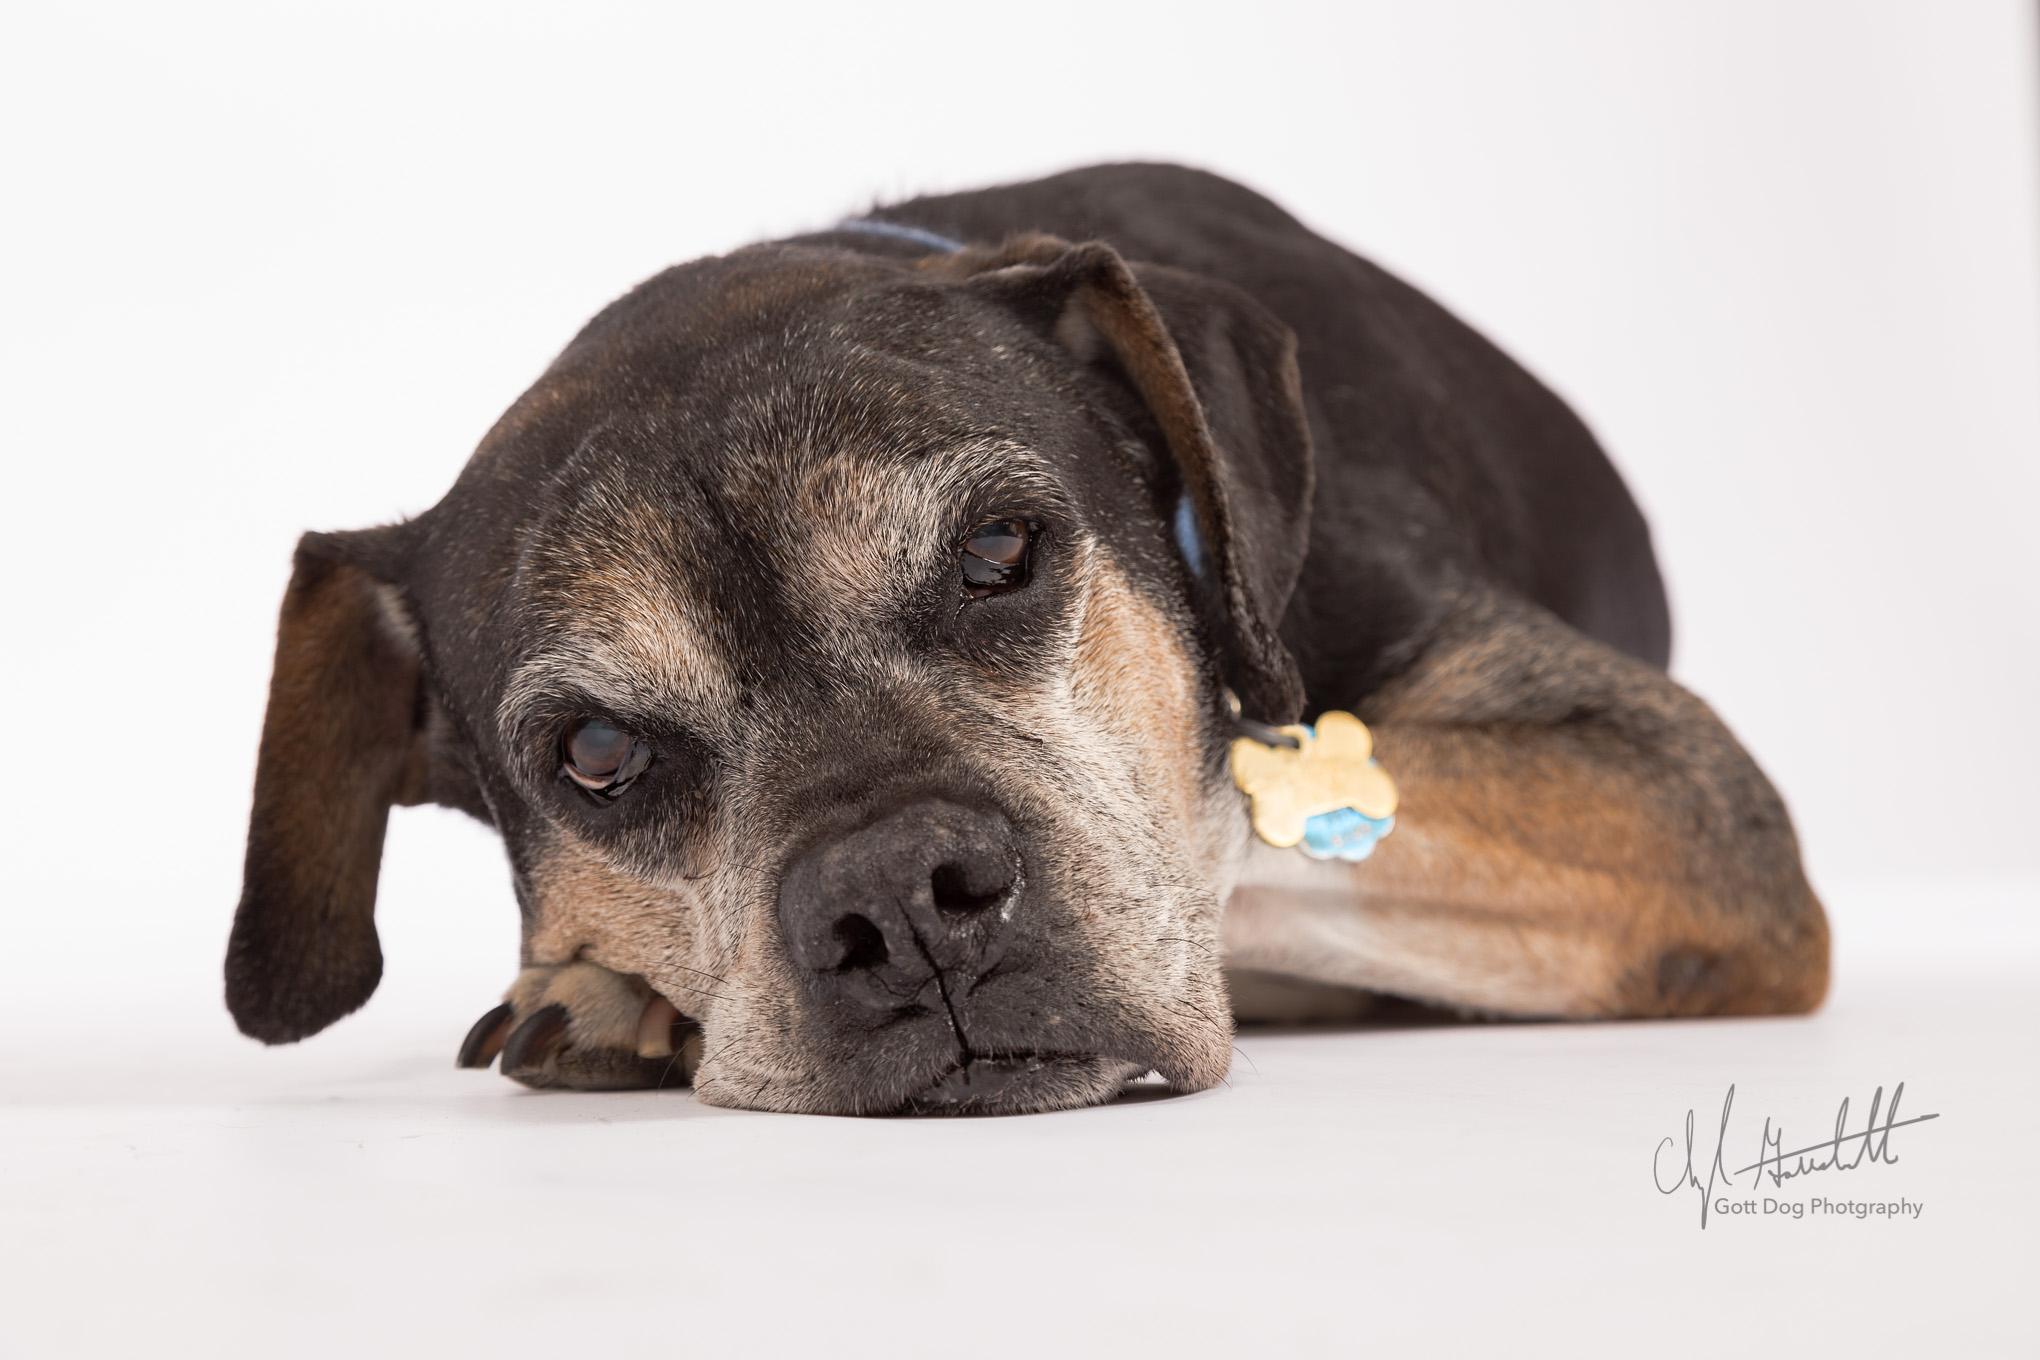 Gott-Dog-Photography-5473-Edit